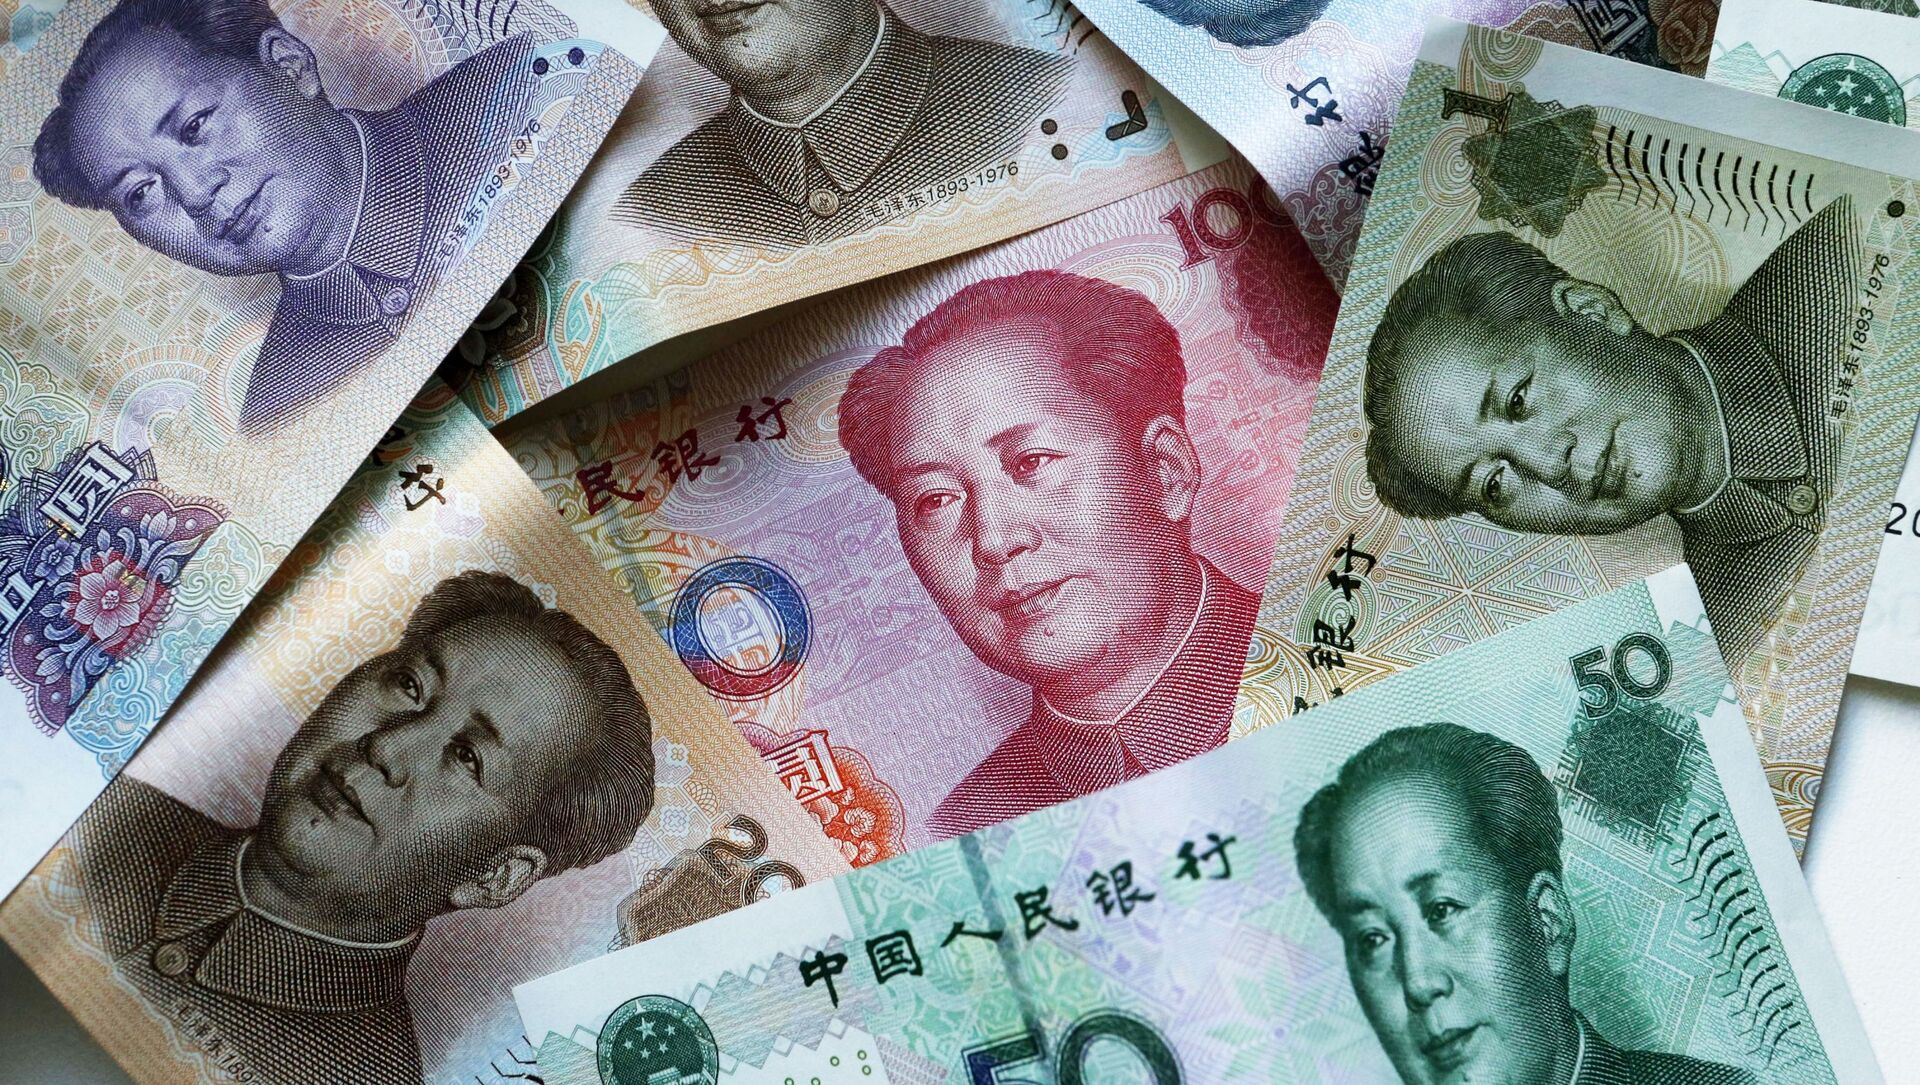 Billetes de yuanes, moneda china - Sputnik Mundo, 1920, 18.01.2021